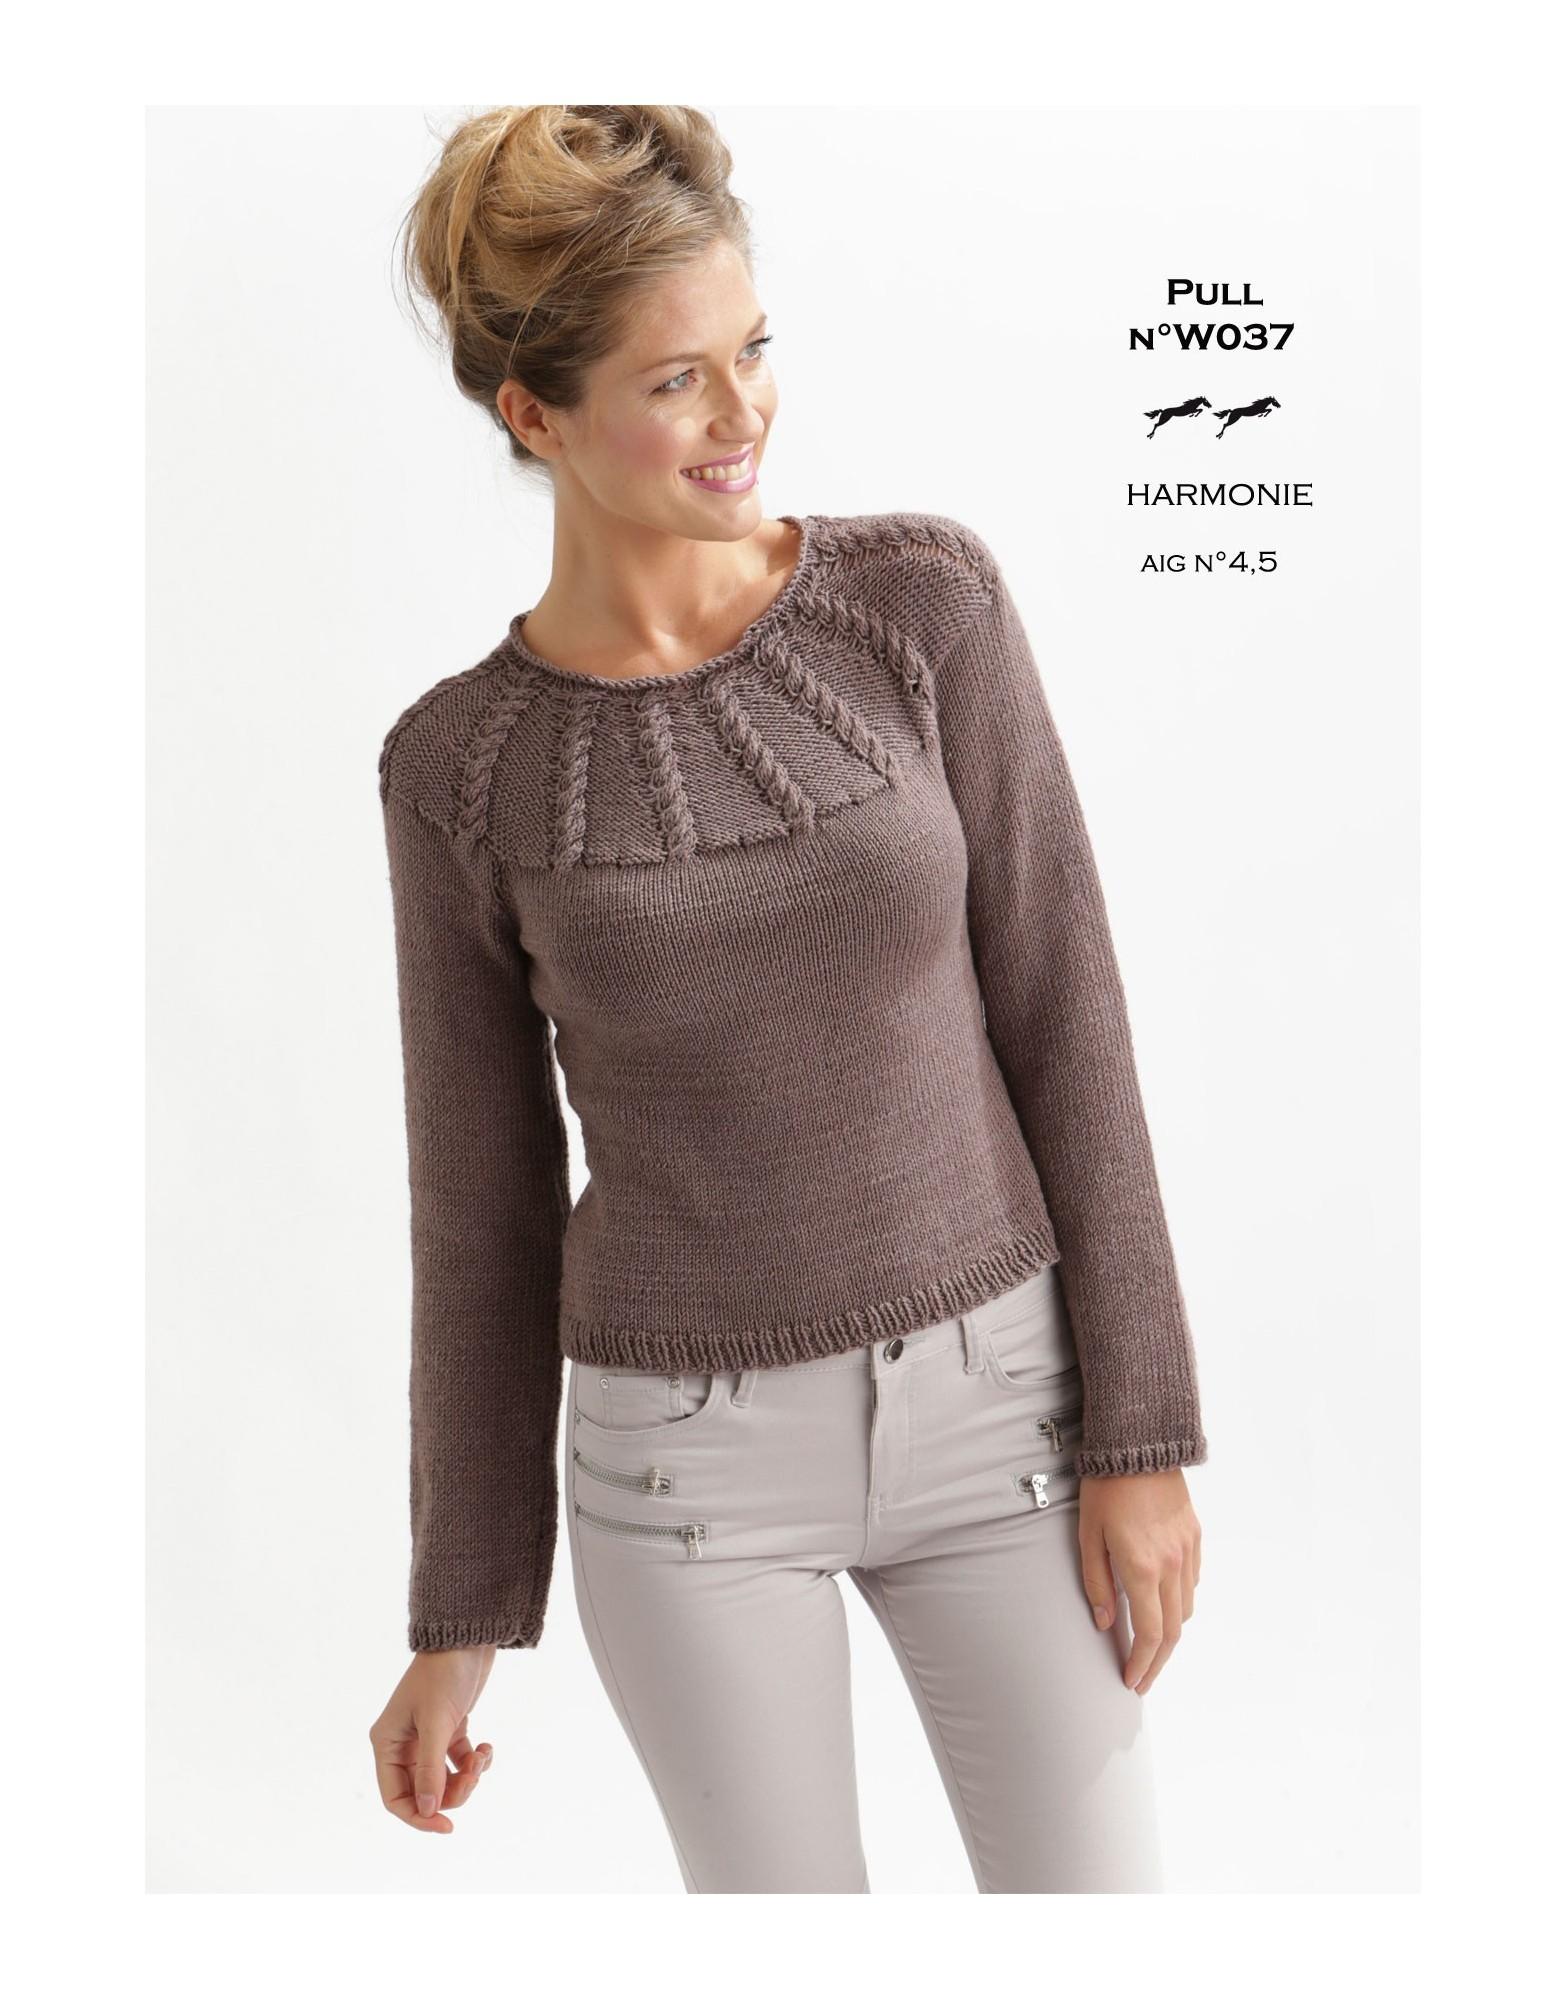 Tricoter robe facile femme